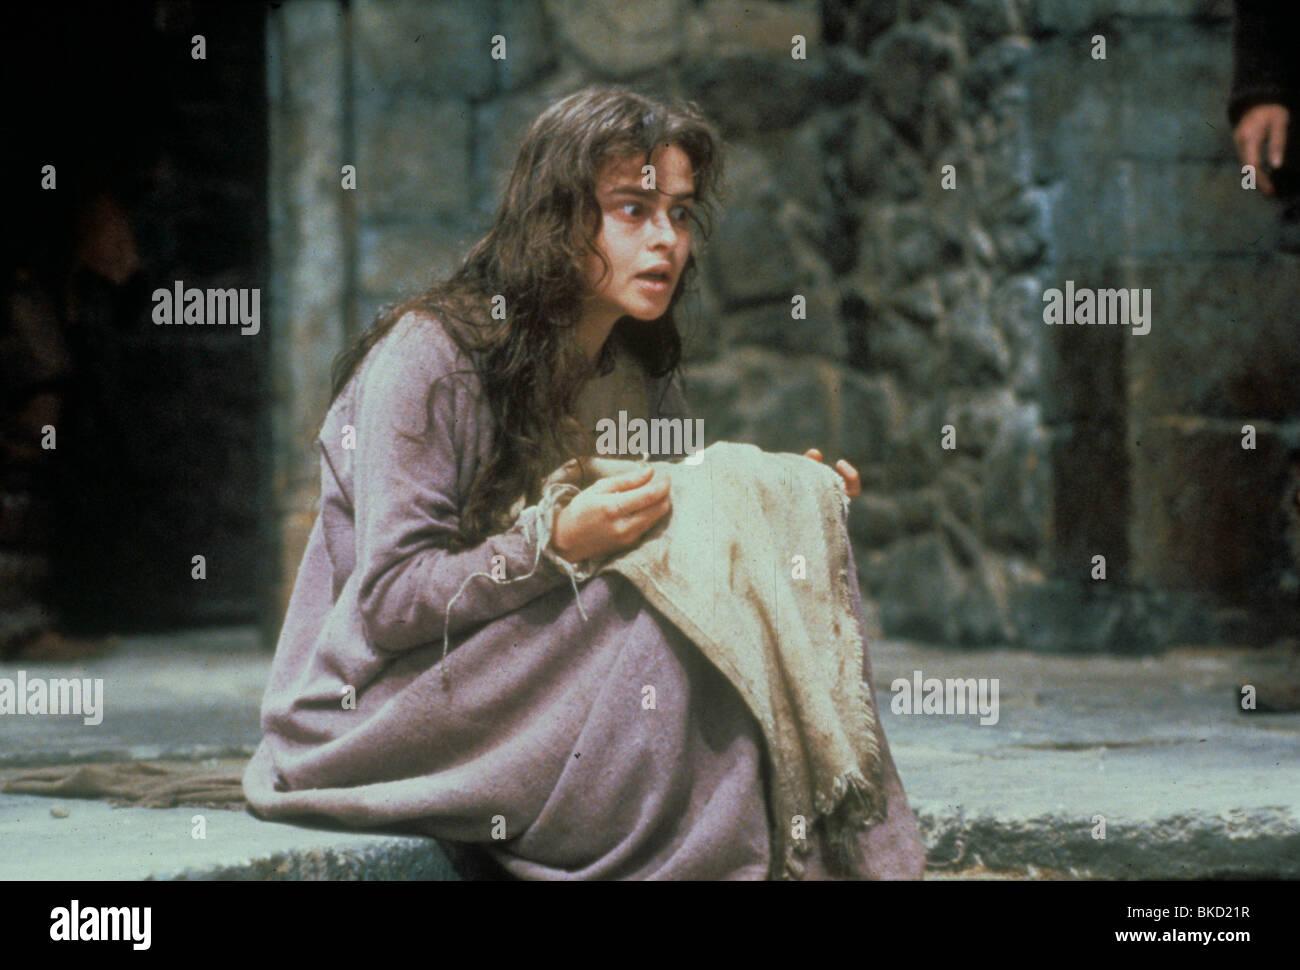 HAMLET (1991) HELENA BONHAM CARTER HAM 030 - Stock Image